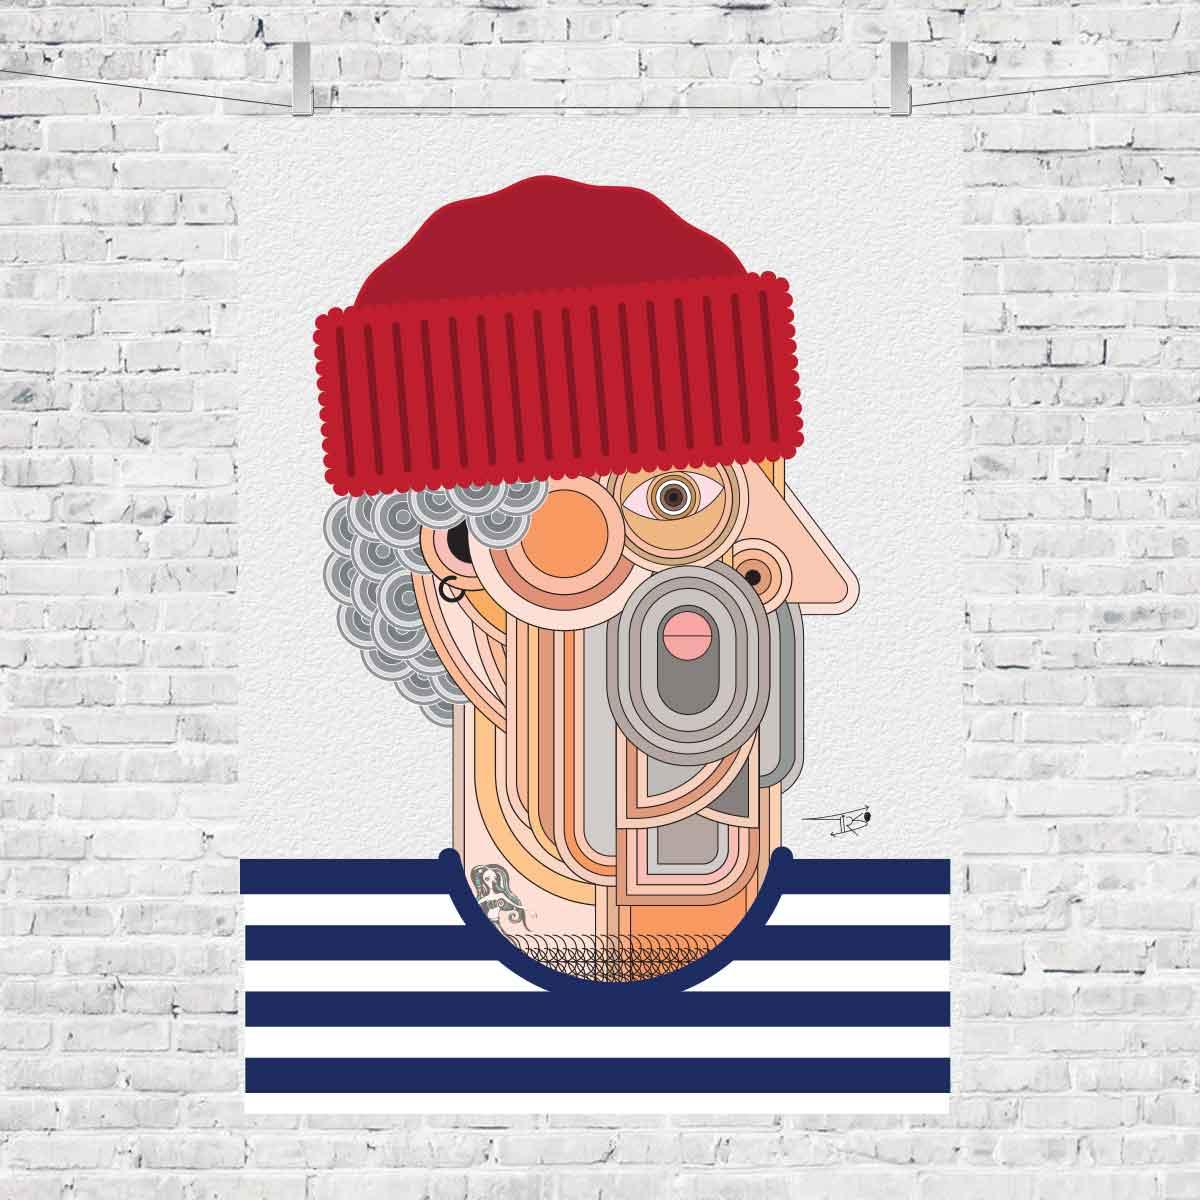 o_mariñeiro_salgado_que_mira_de_medio_lado_bayprints_souvinir_shop_tienda_souvenirs_baiona_souvenart_shop_diseño_tirso_sanchez_otaegui